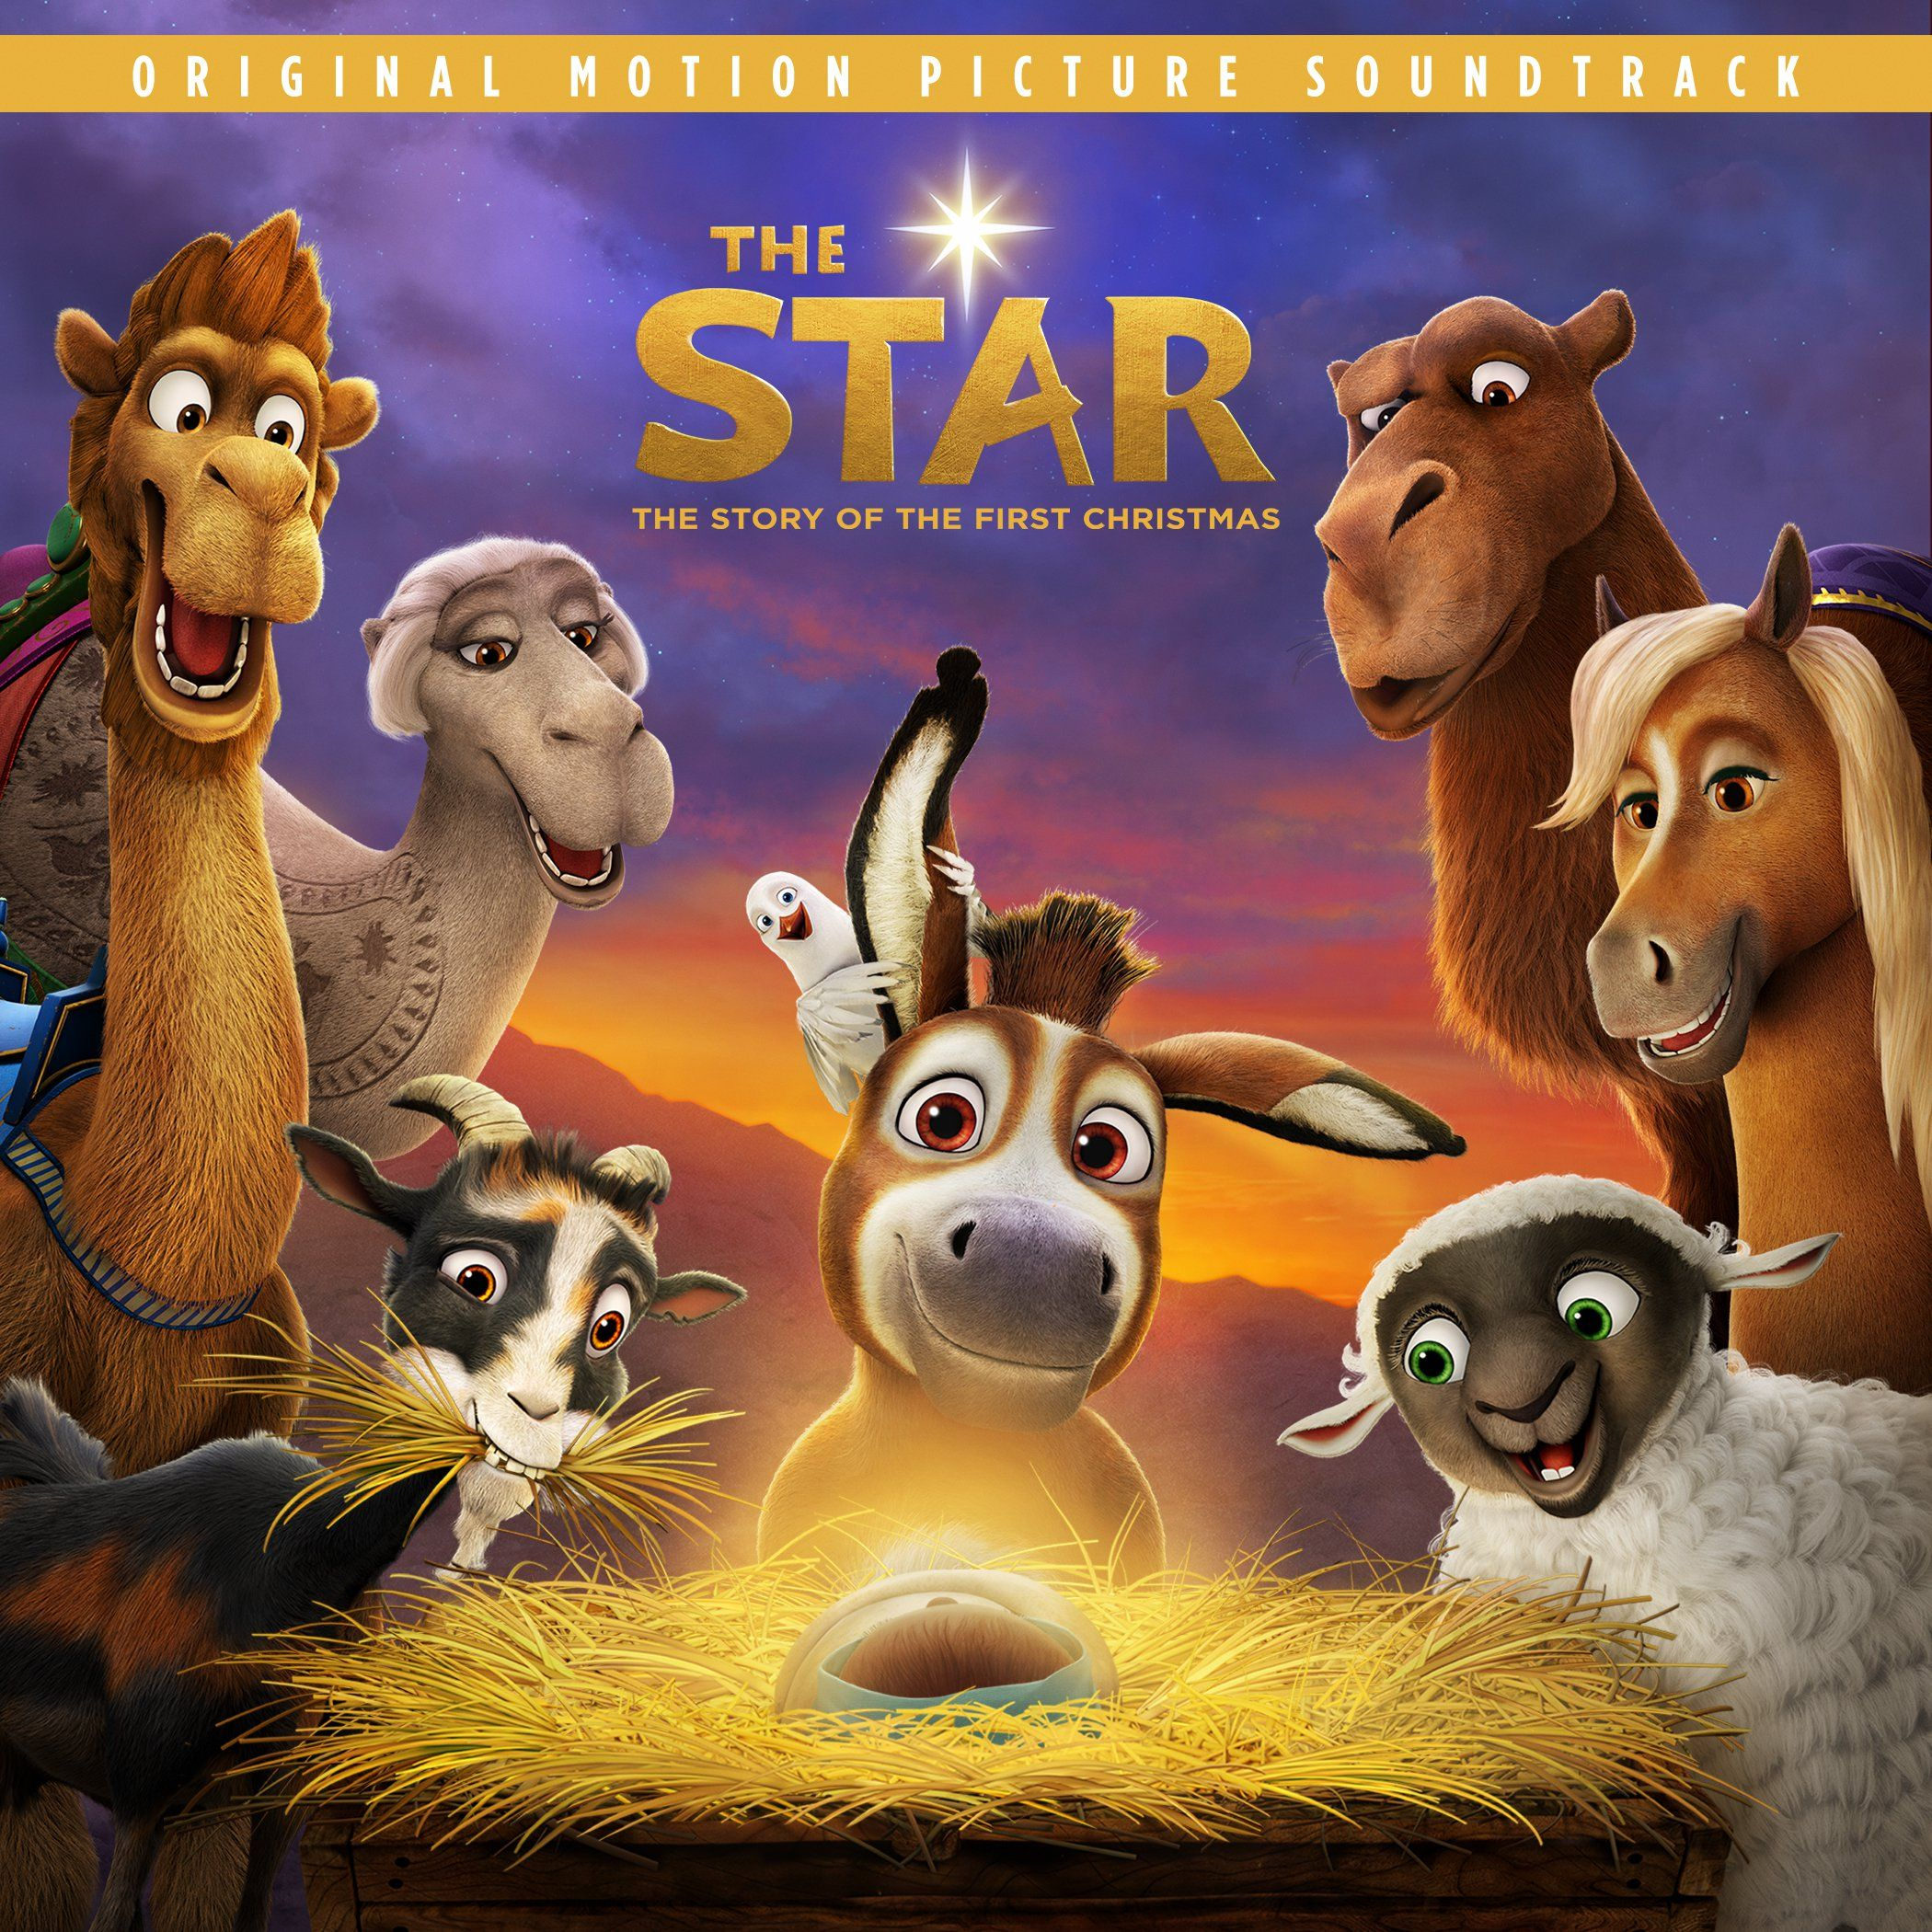 Watch The Star (2017) OnLine Free Movie HD, HQ, DvDrip, fLv ...